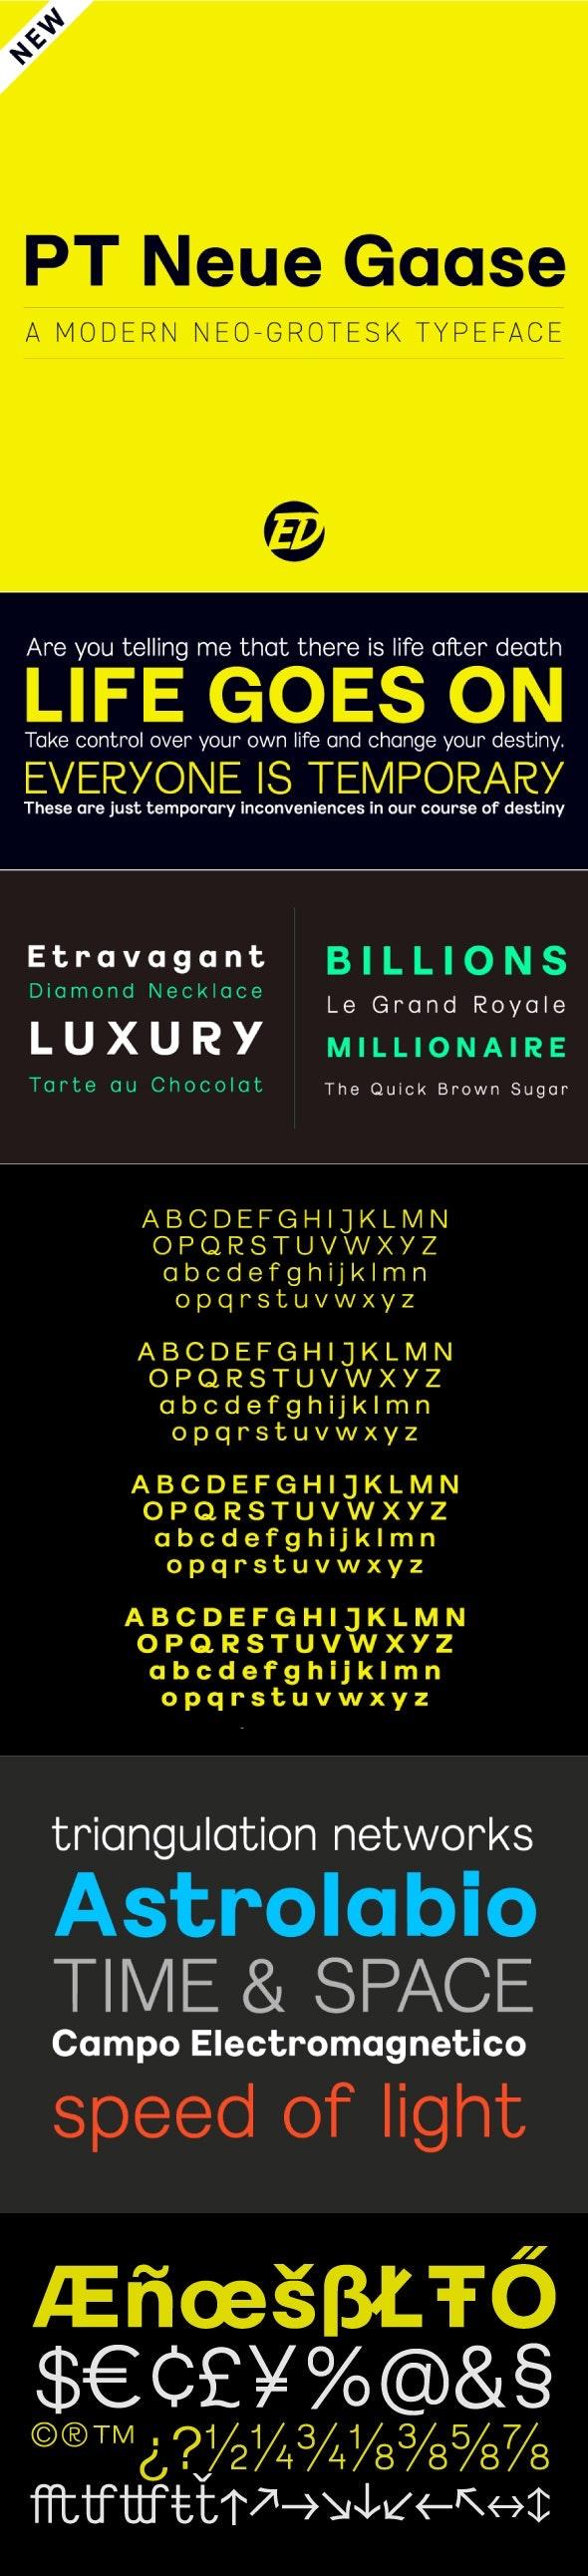 PT Neue Gaase Font - Miscellaneous Sans-Serif